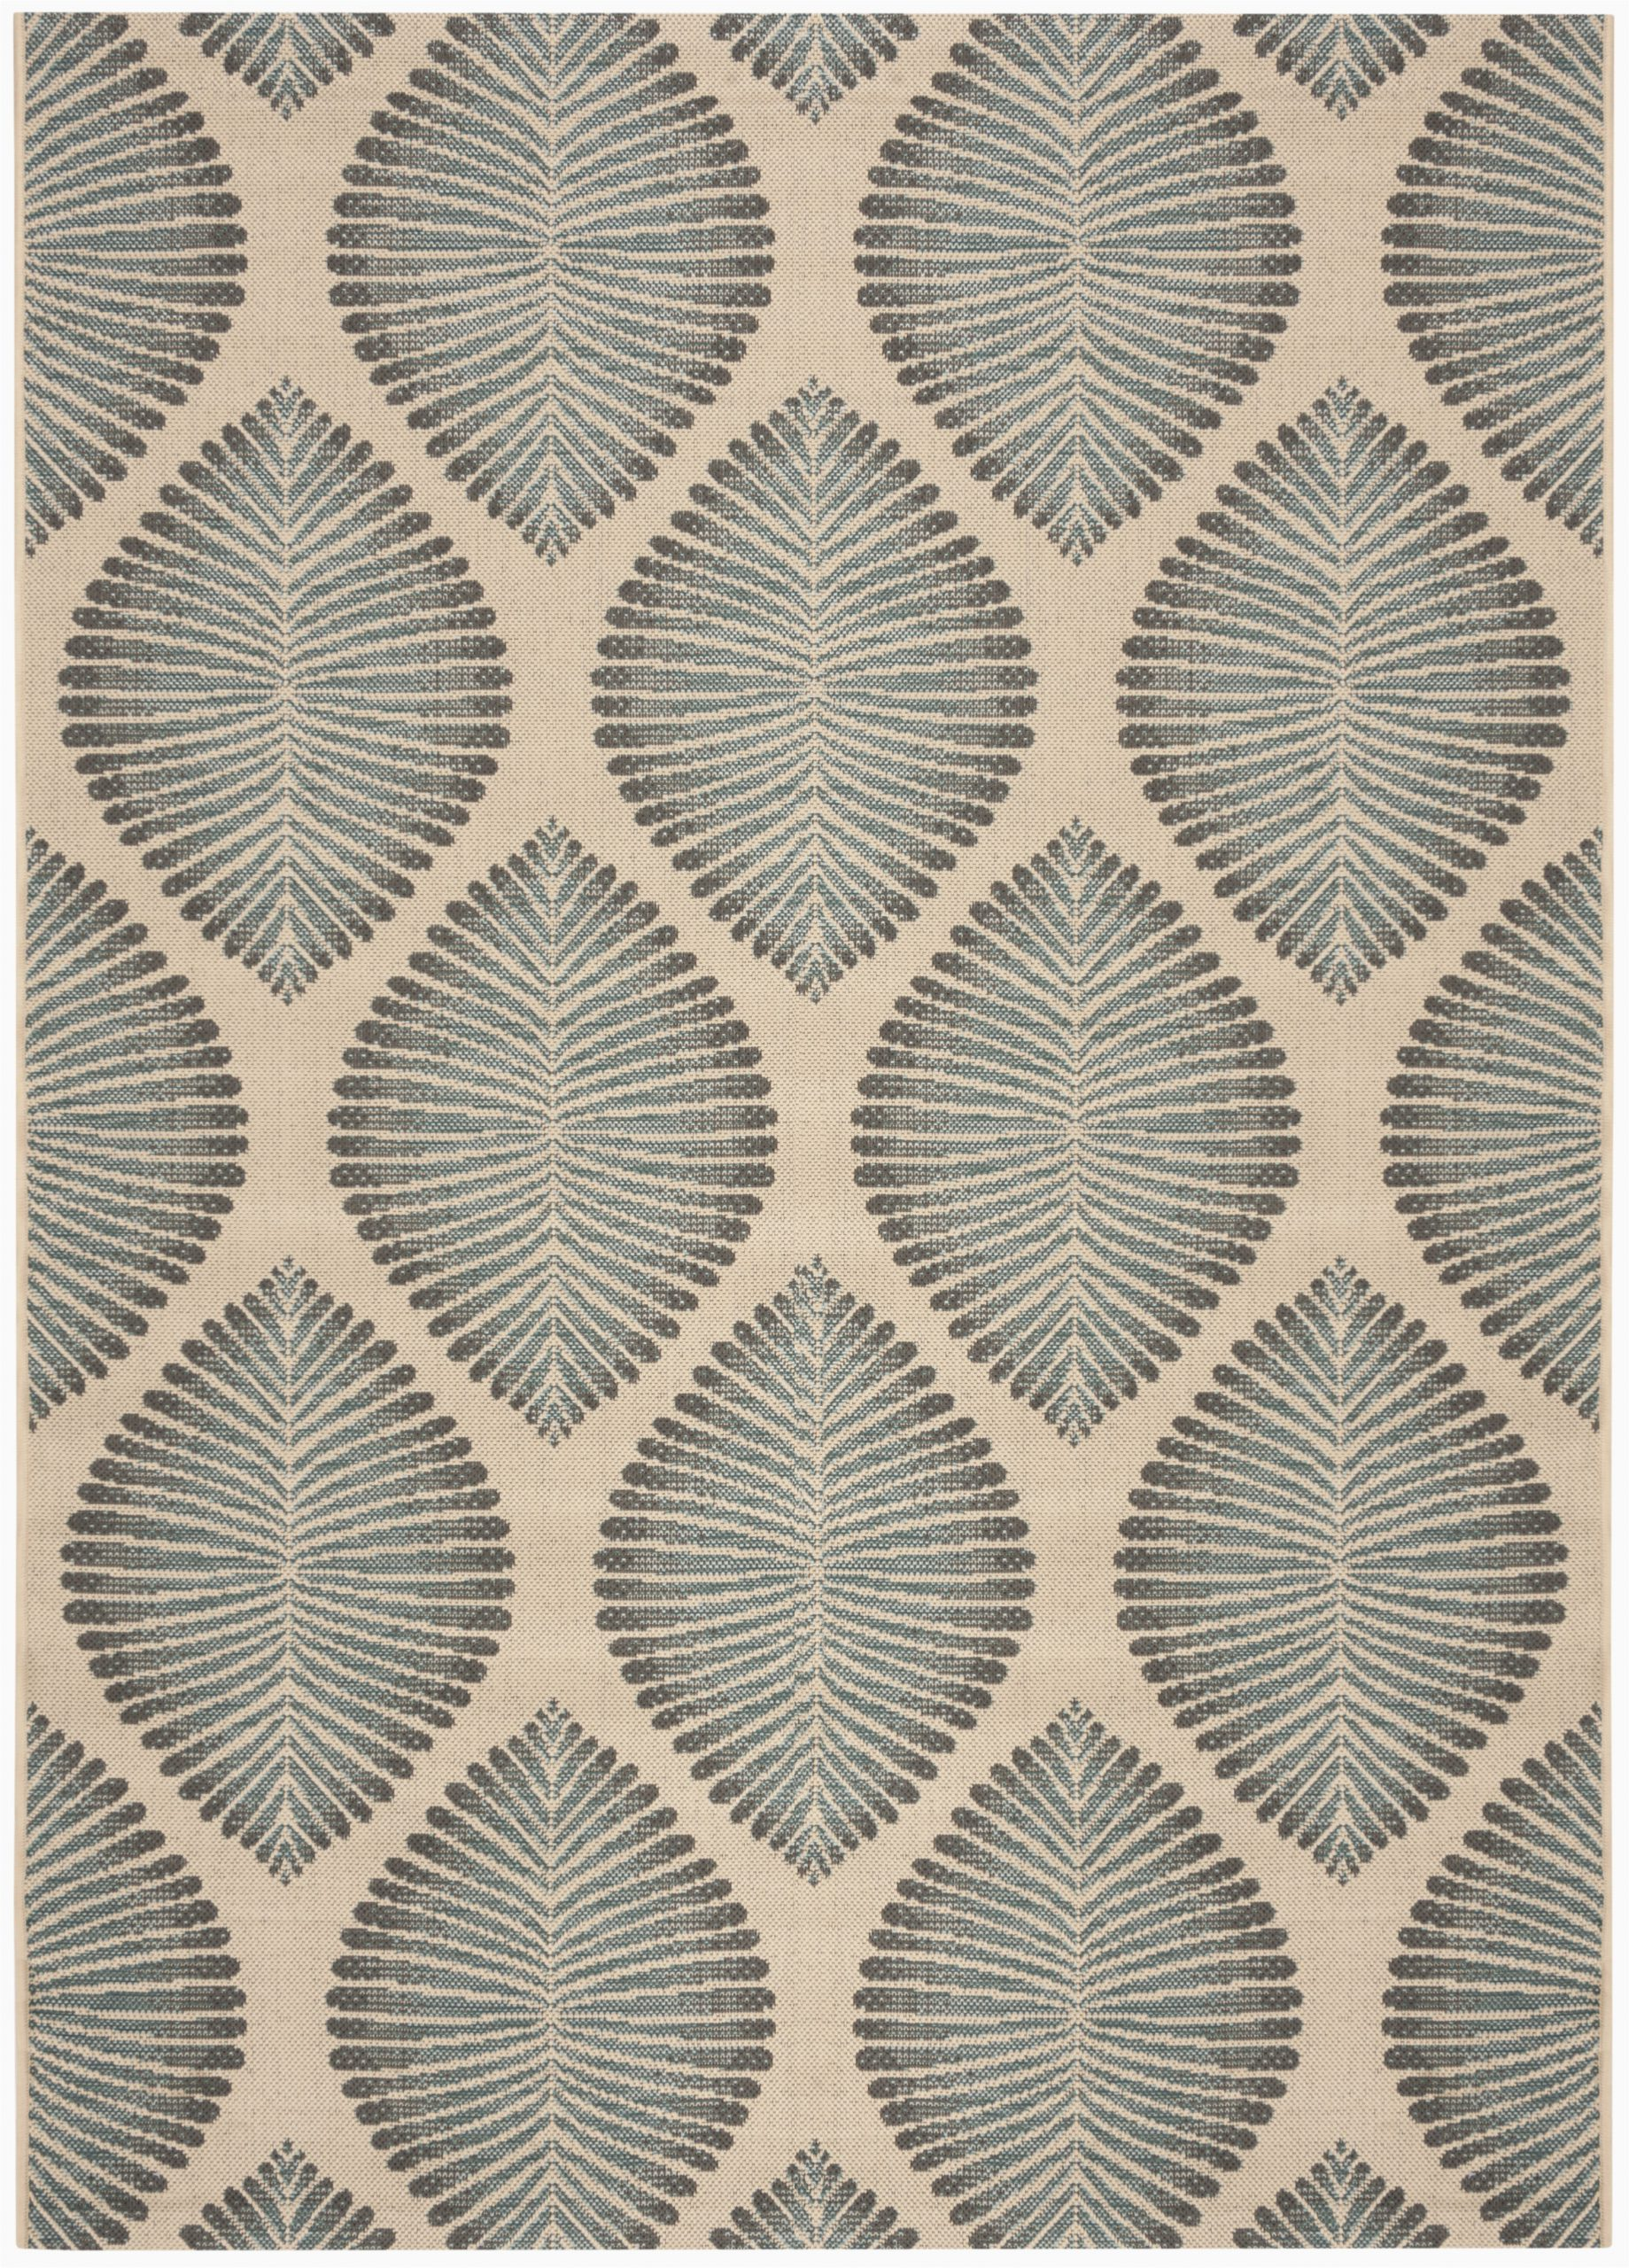 wickford beigeanthracite area rug